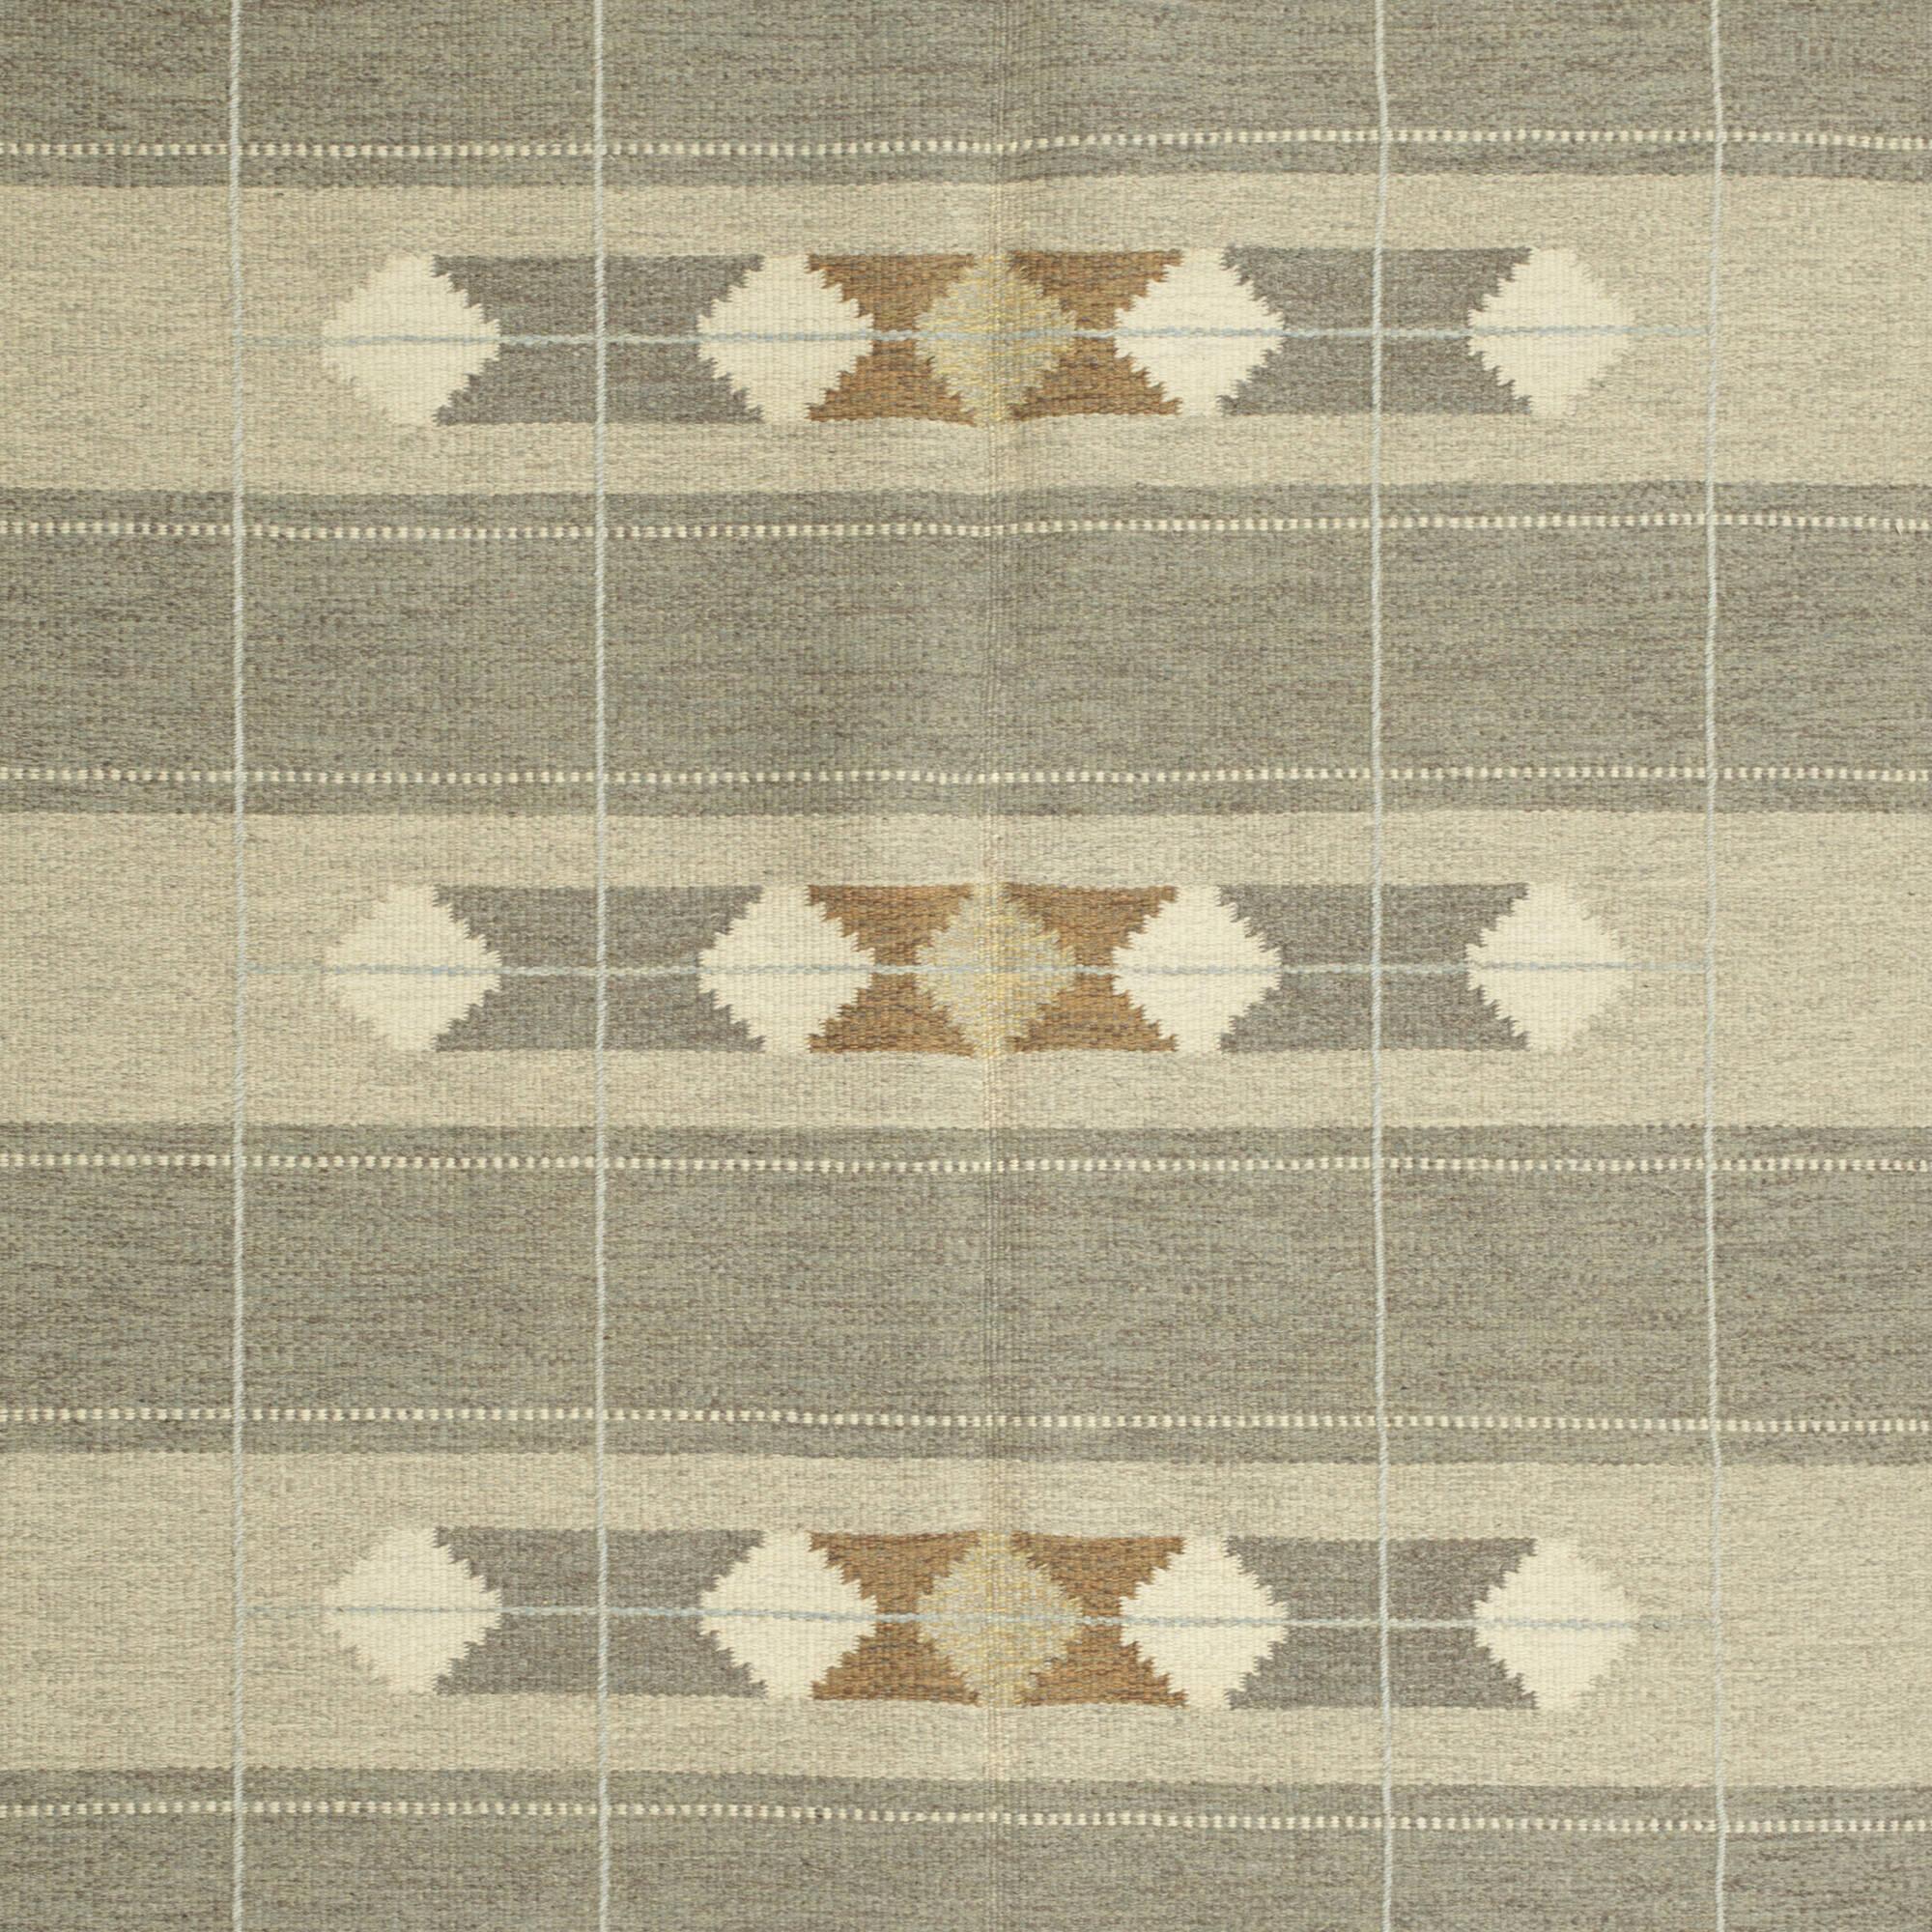 302: Swedish / flatweave carpet (2 of 2)